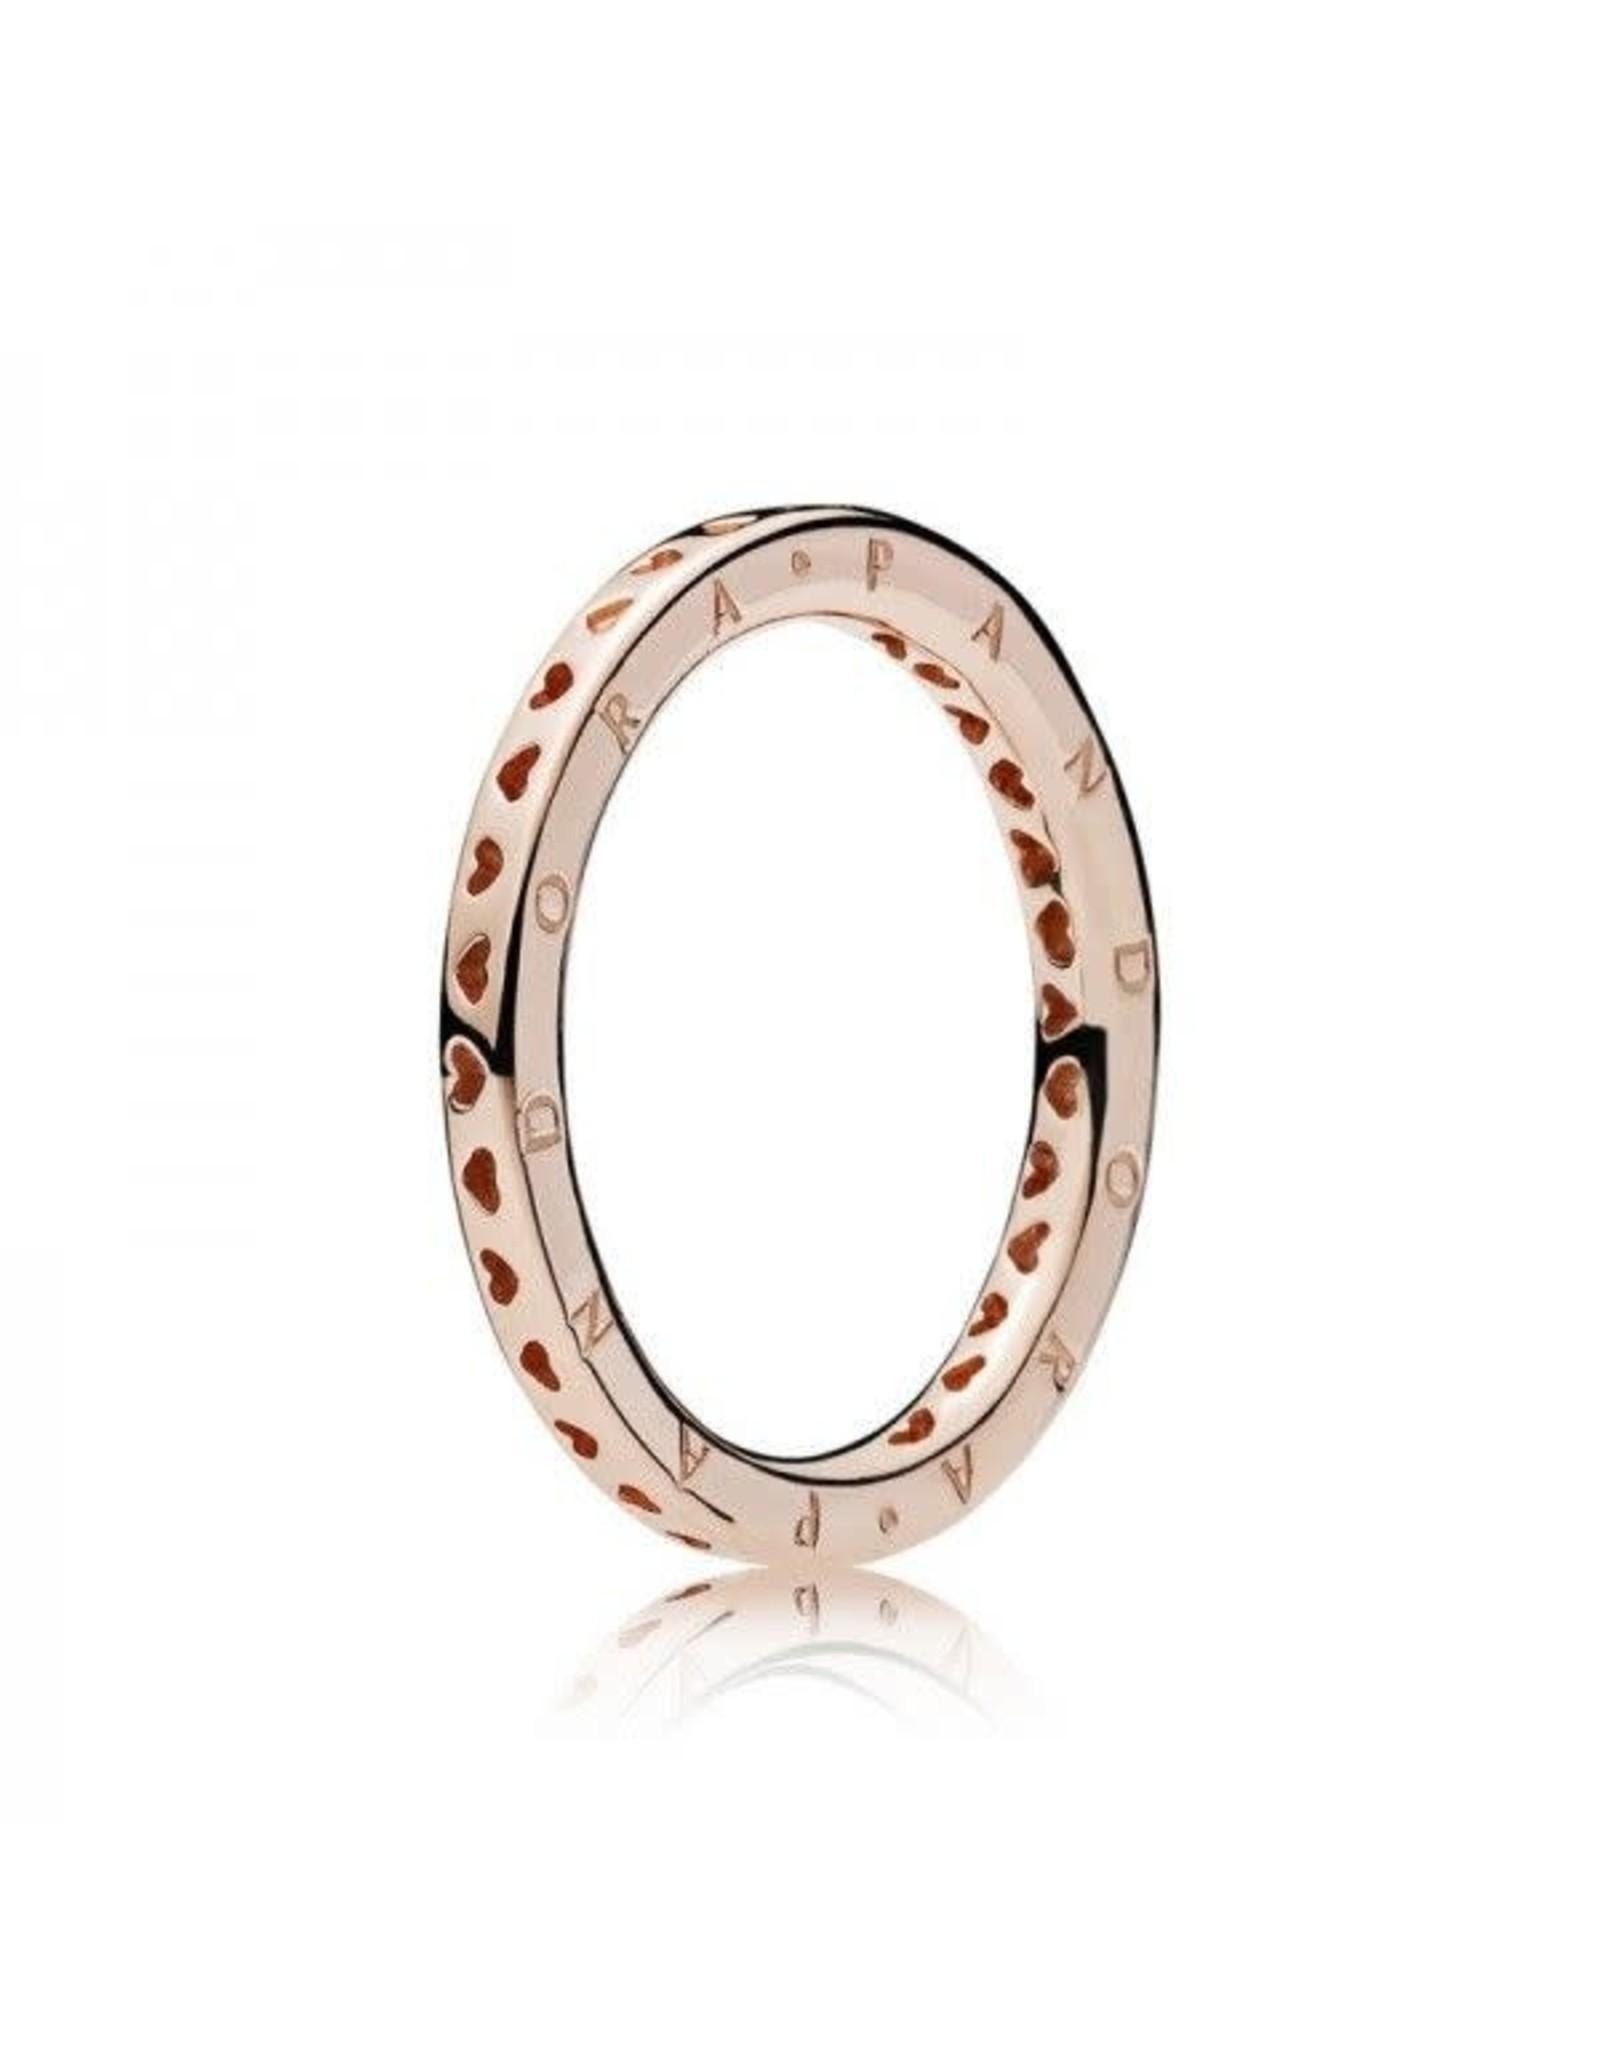 Pandora Pandora Ring, Rose Gold, Hearts & Pandora Logo